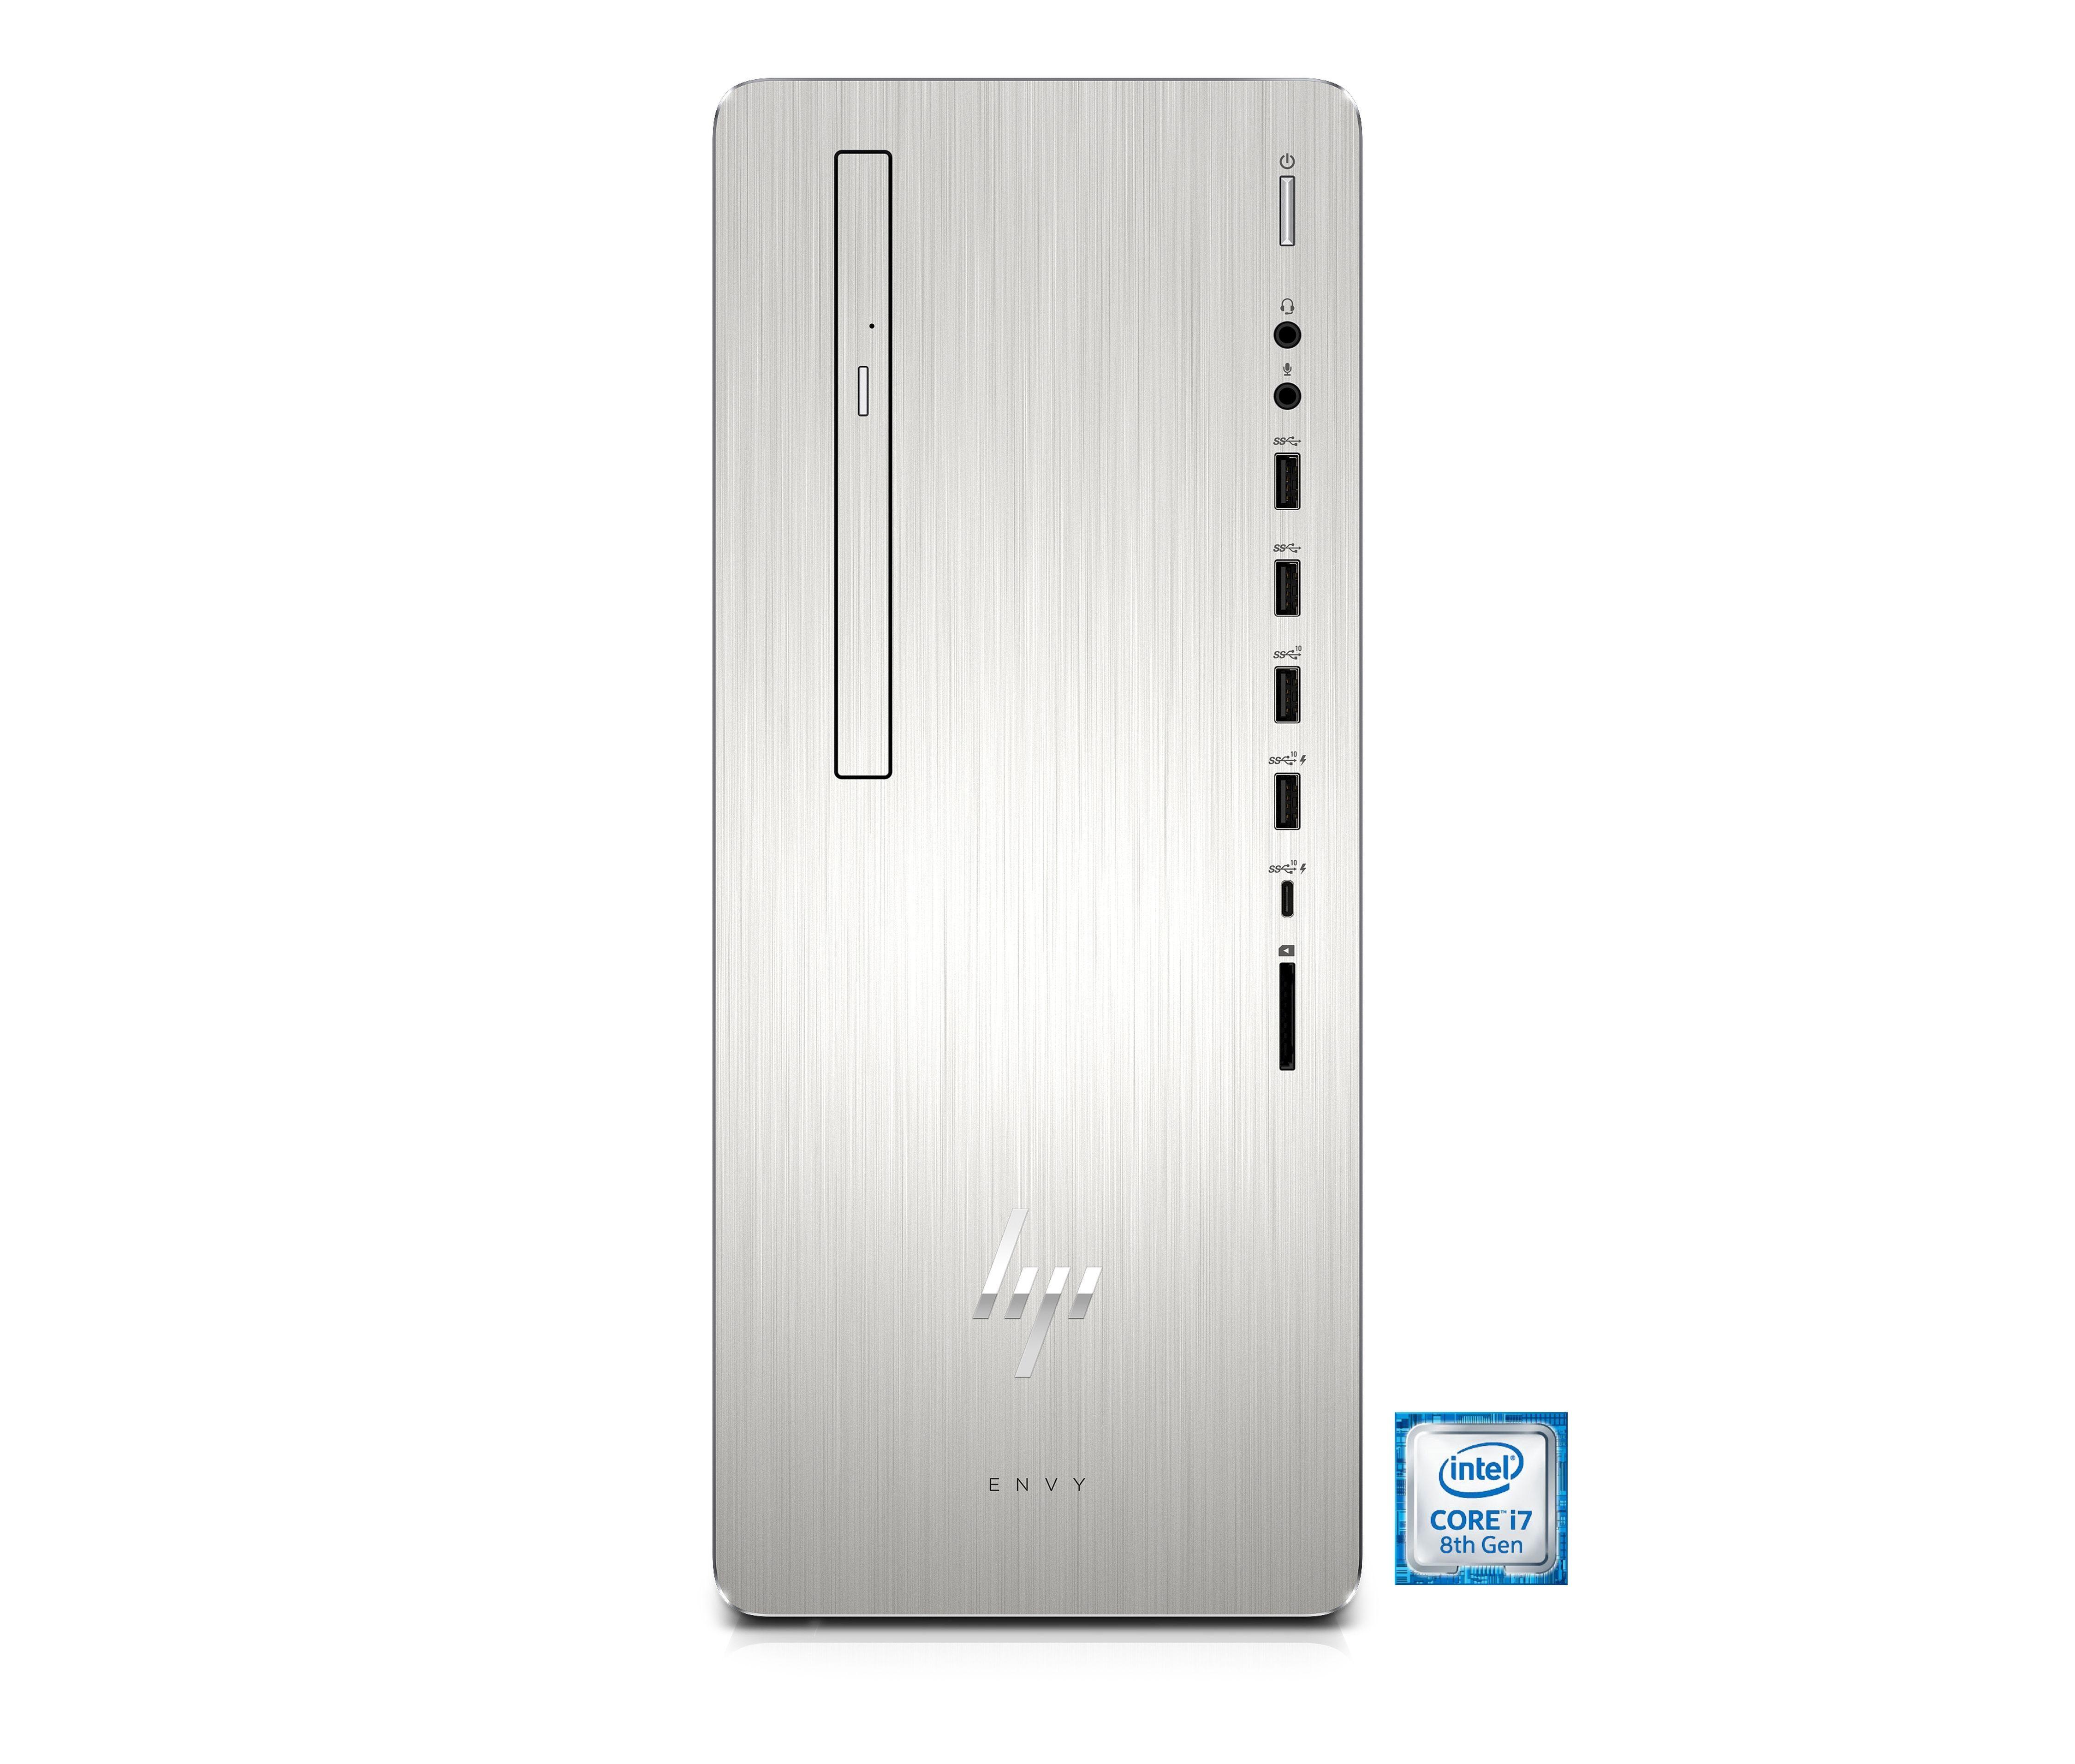 HP ENVY 795-0500ng Desktop PC »Intel Core i7, 256 GB SSD + 1 TB, 16 GB«